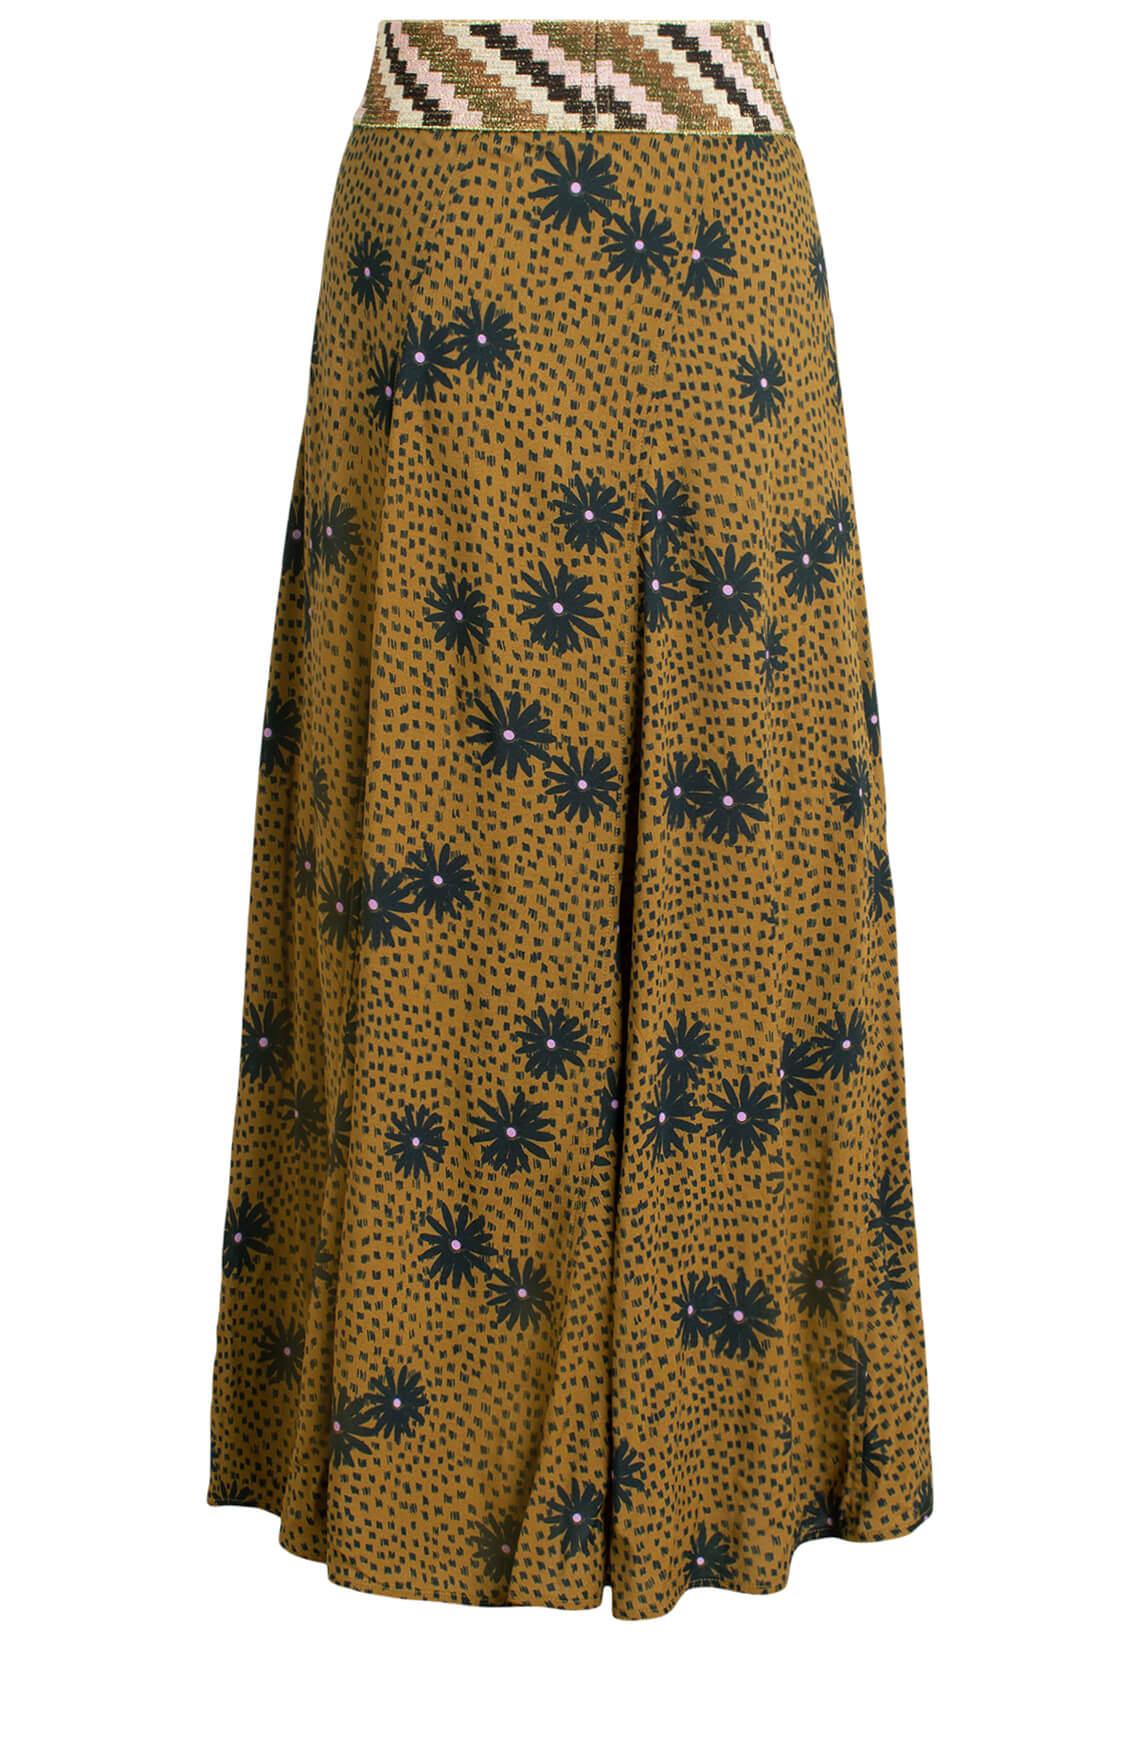 Anna Dames Rok met bloemenprint groen